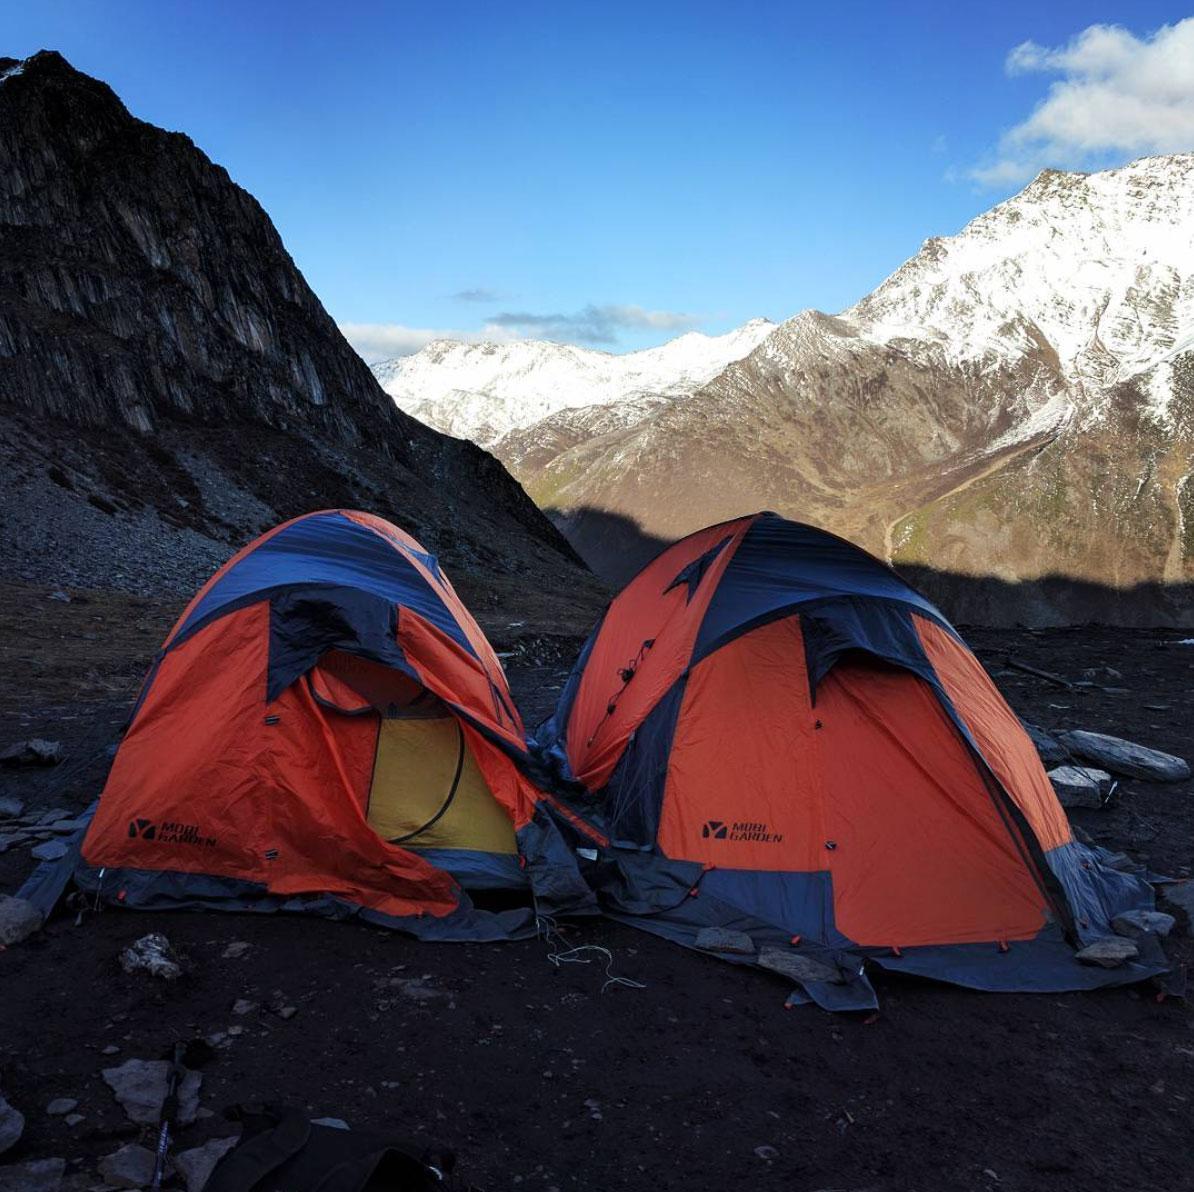 made-ziius-munichmountaingirls-campen-berge-sichuan-erfang-basecamp-china